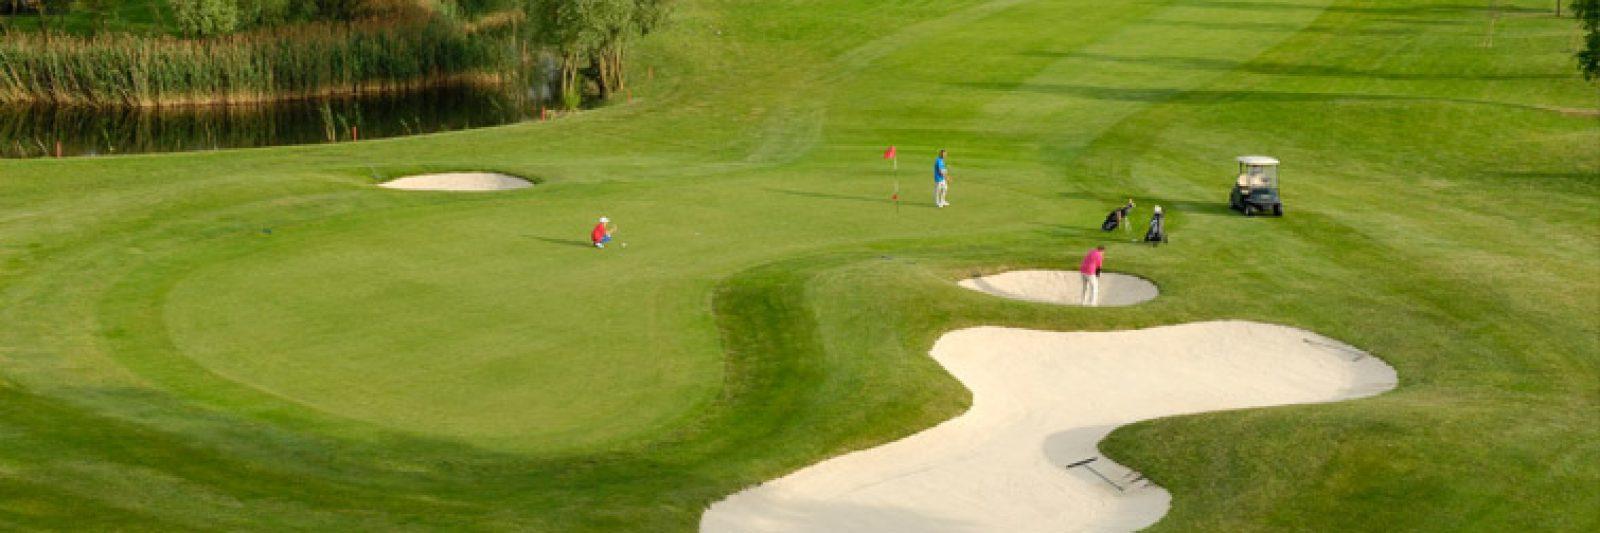 Golf im Marchfeld